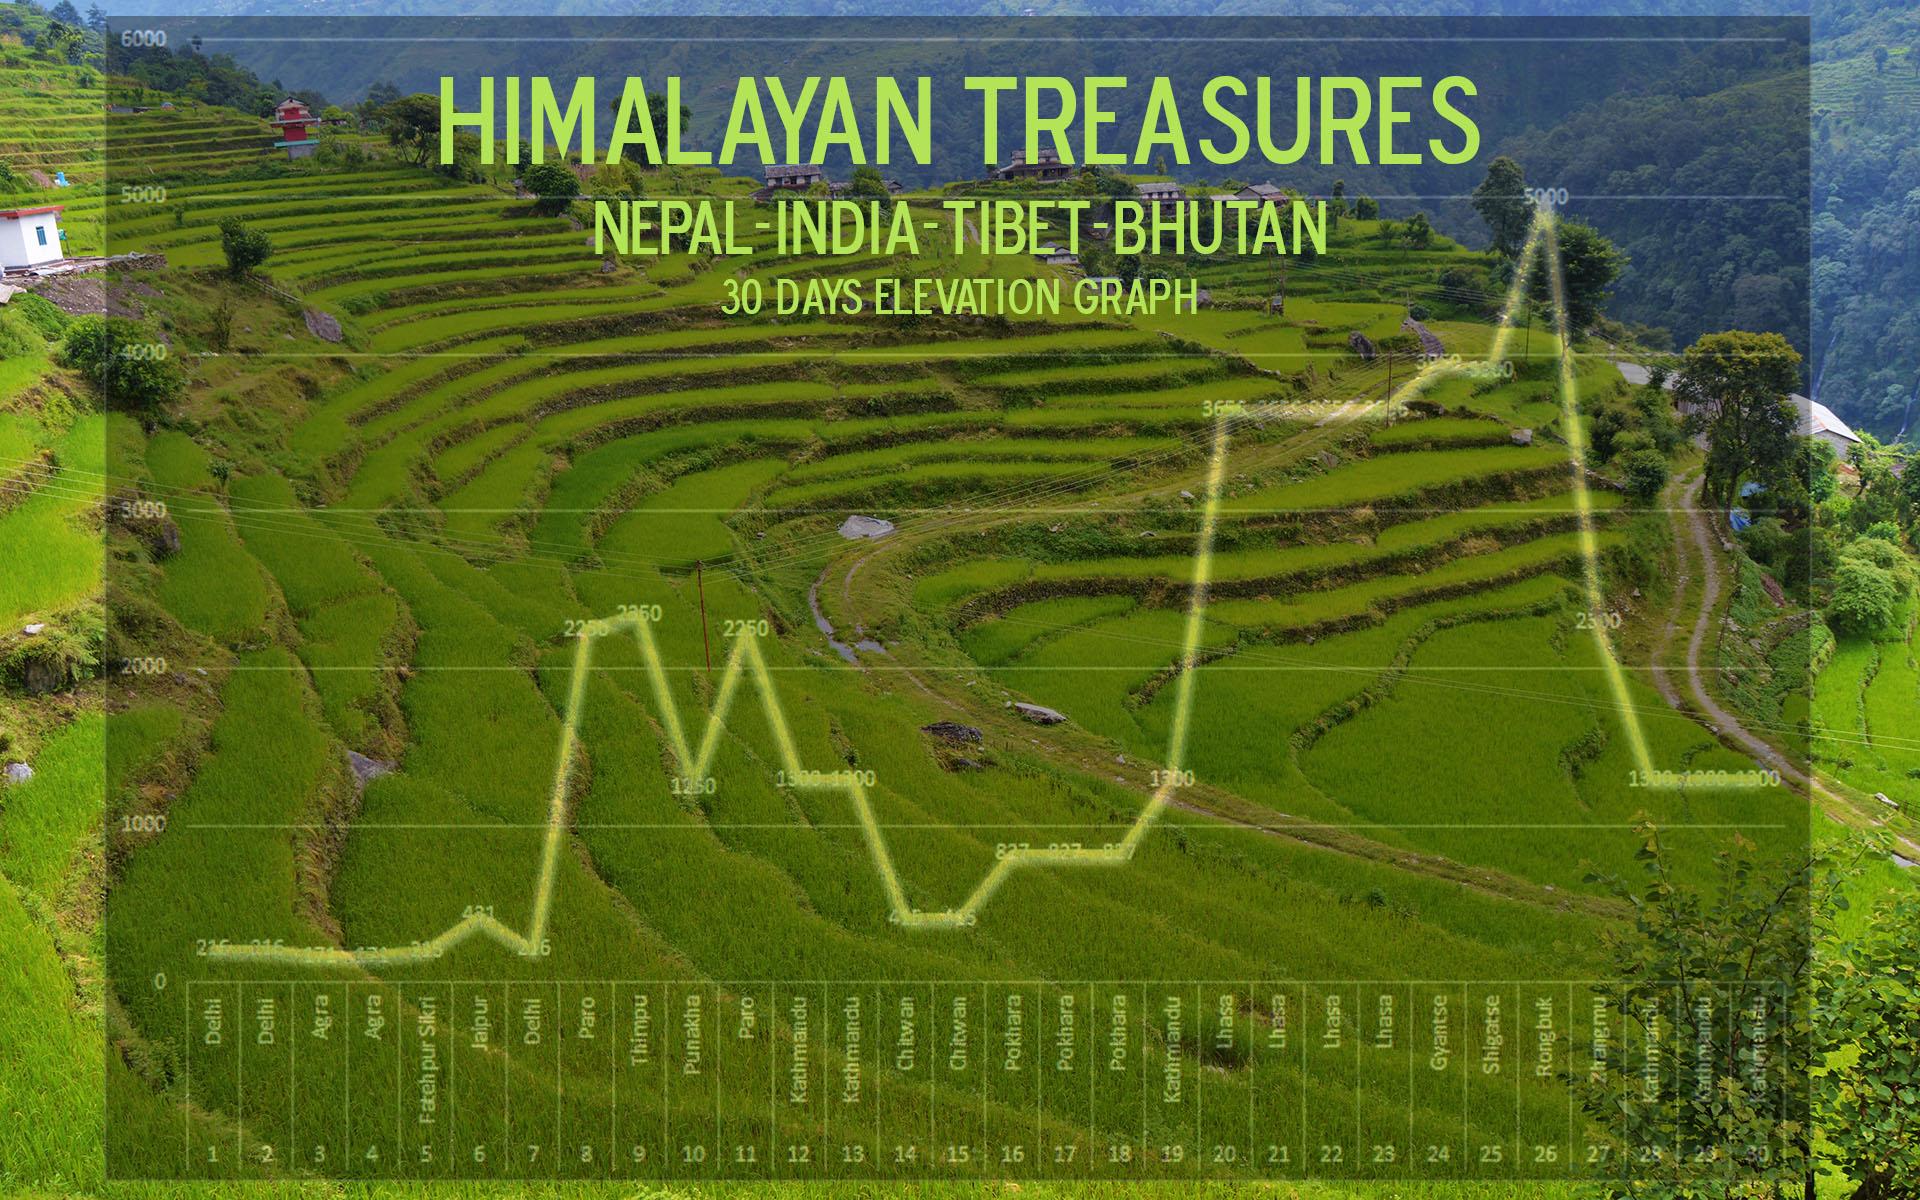 Himalayan Treasures